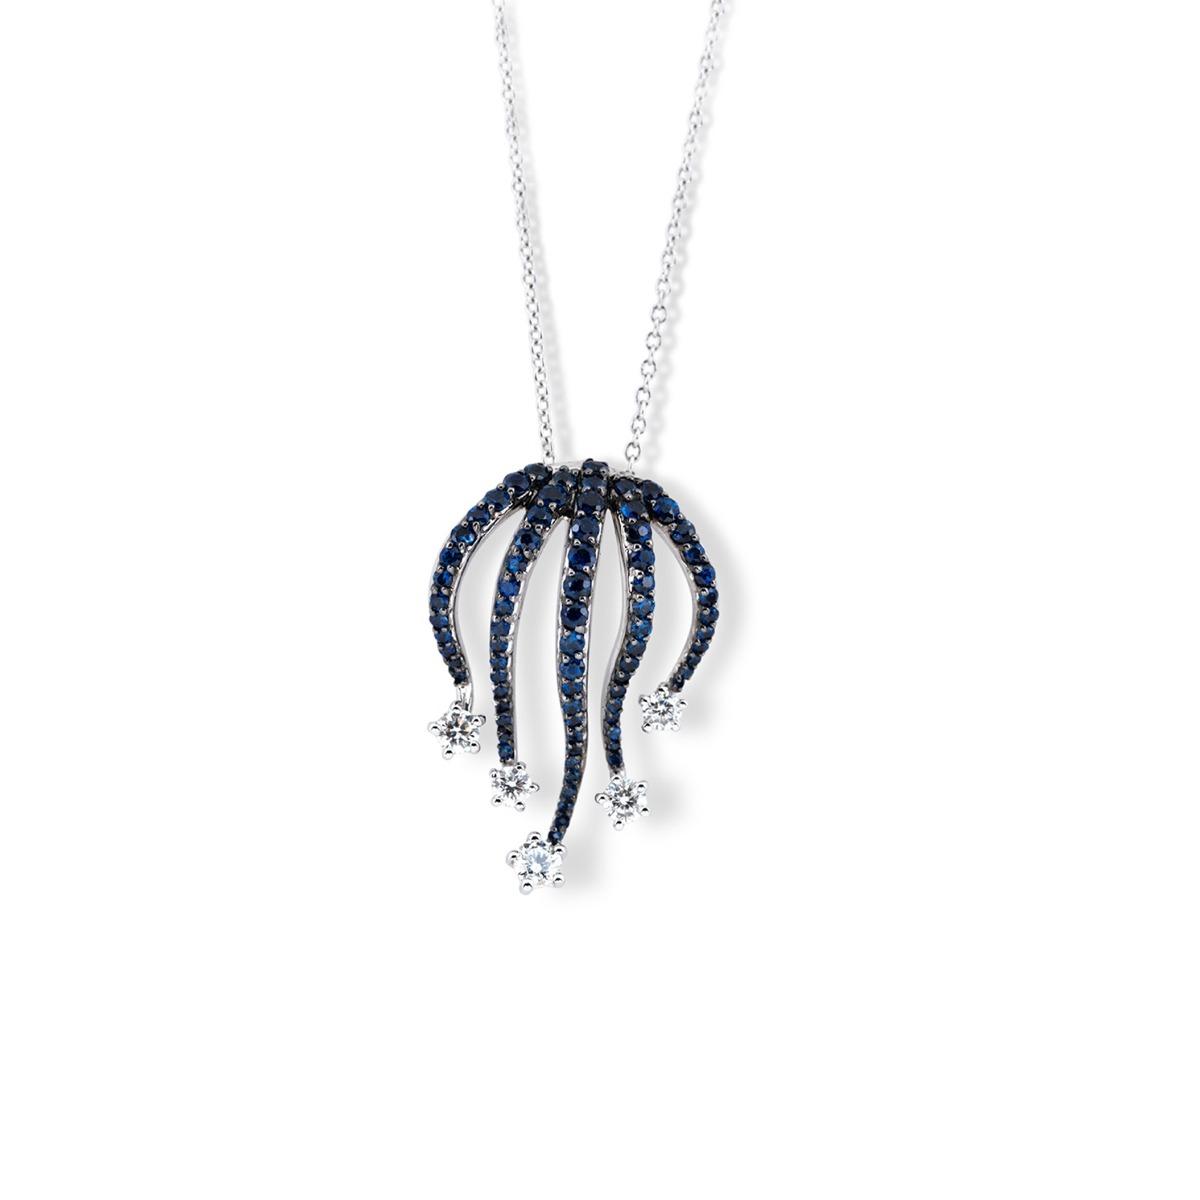 Starry Night Sapphire and Diamond Pendant Necklace